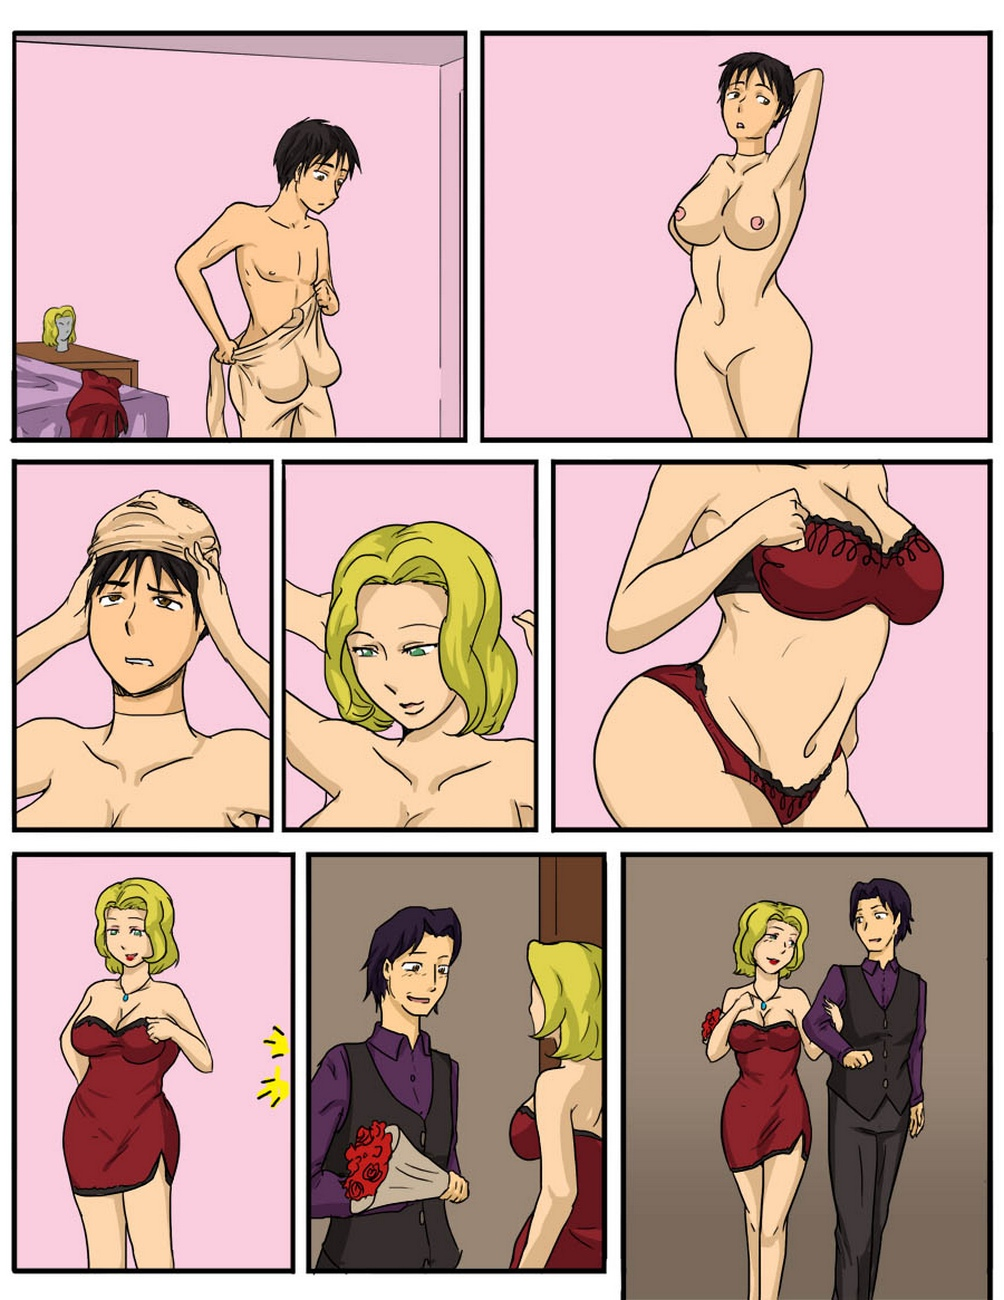 The-Waitress-1 6 free sex comic